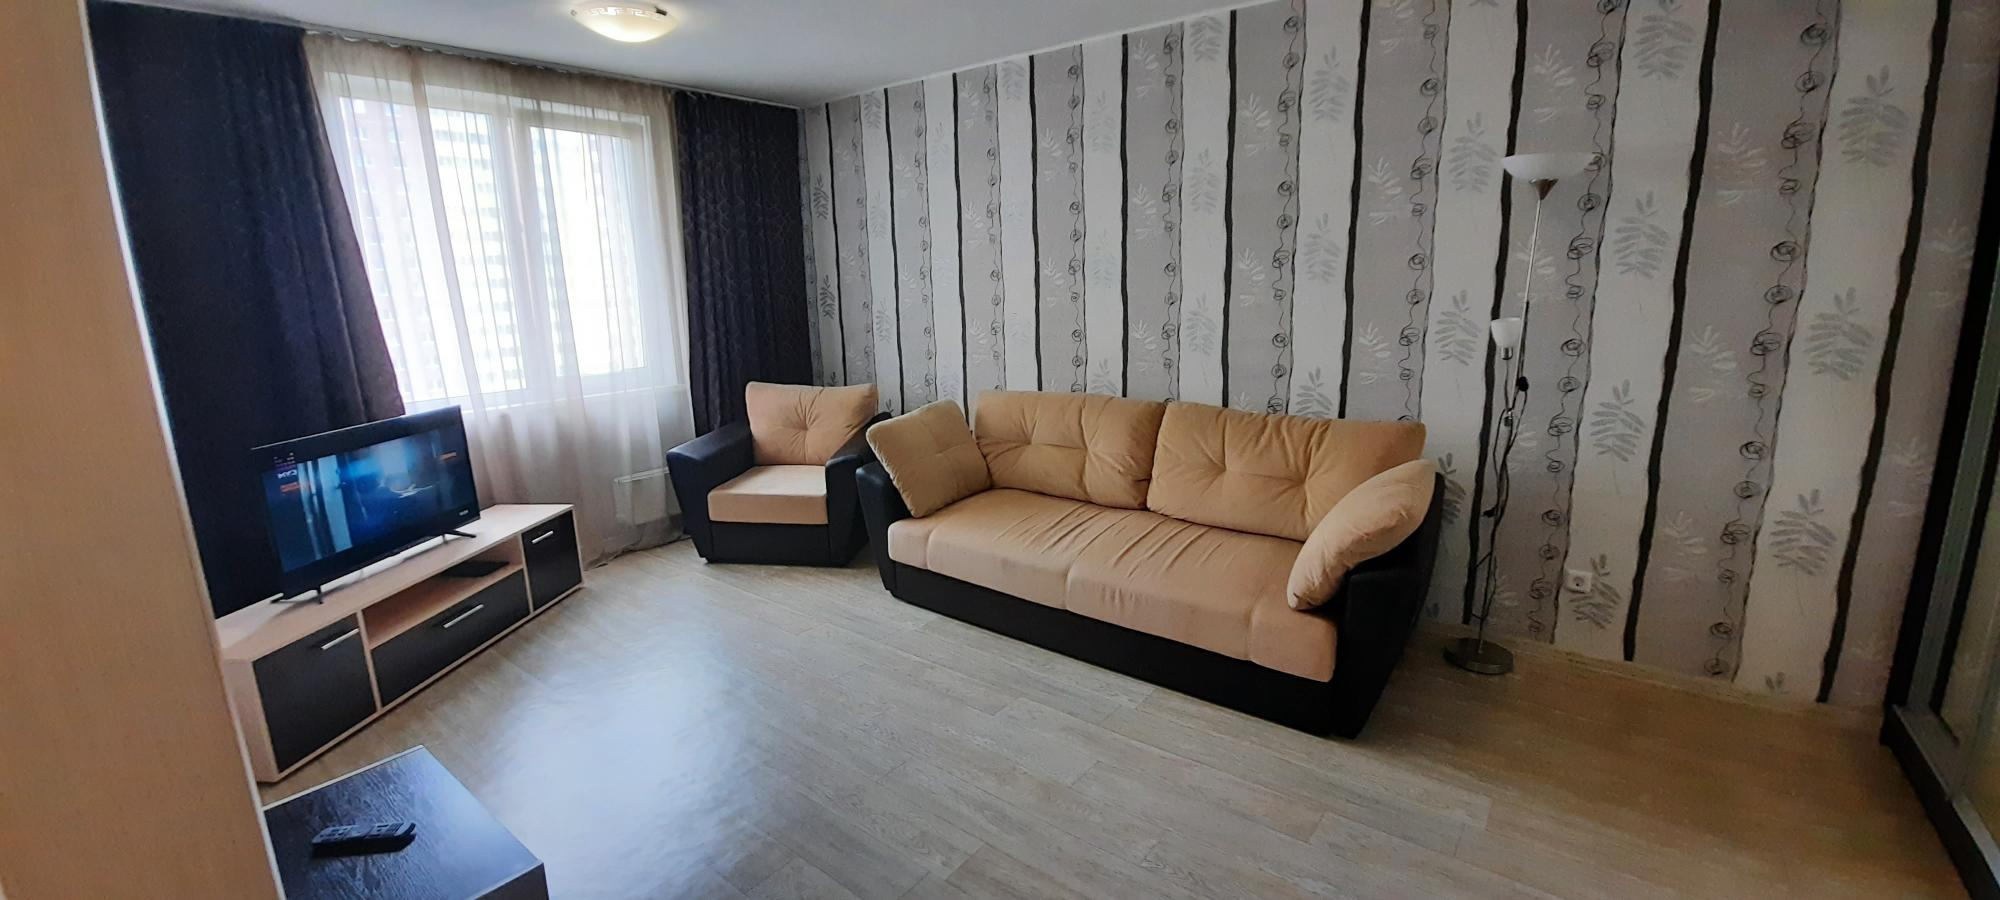 1к квартира Ботанический бульвар, 17 | 17000 | аренда в Красноярске фото 0